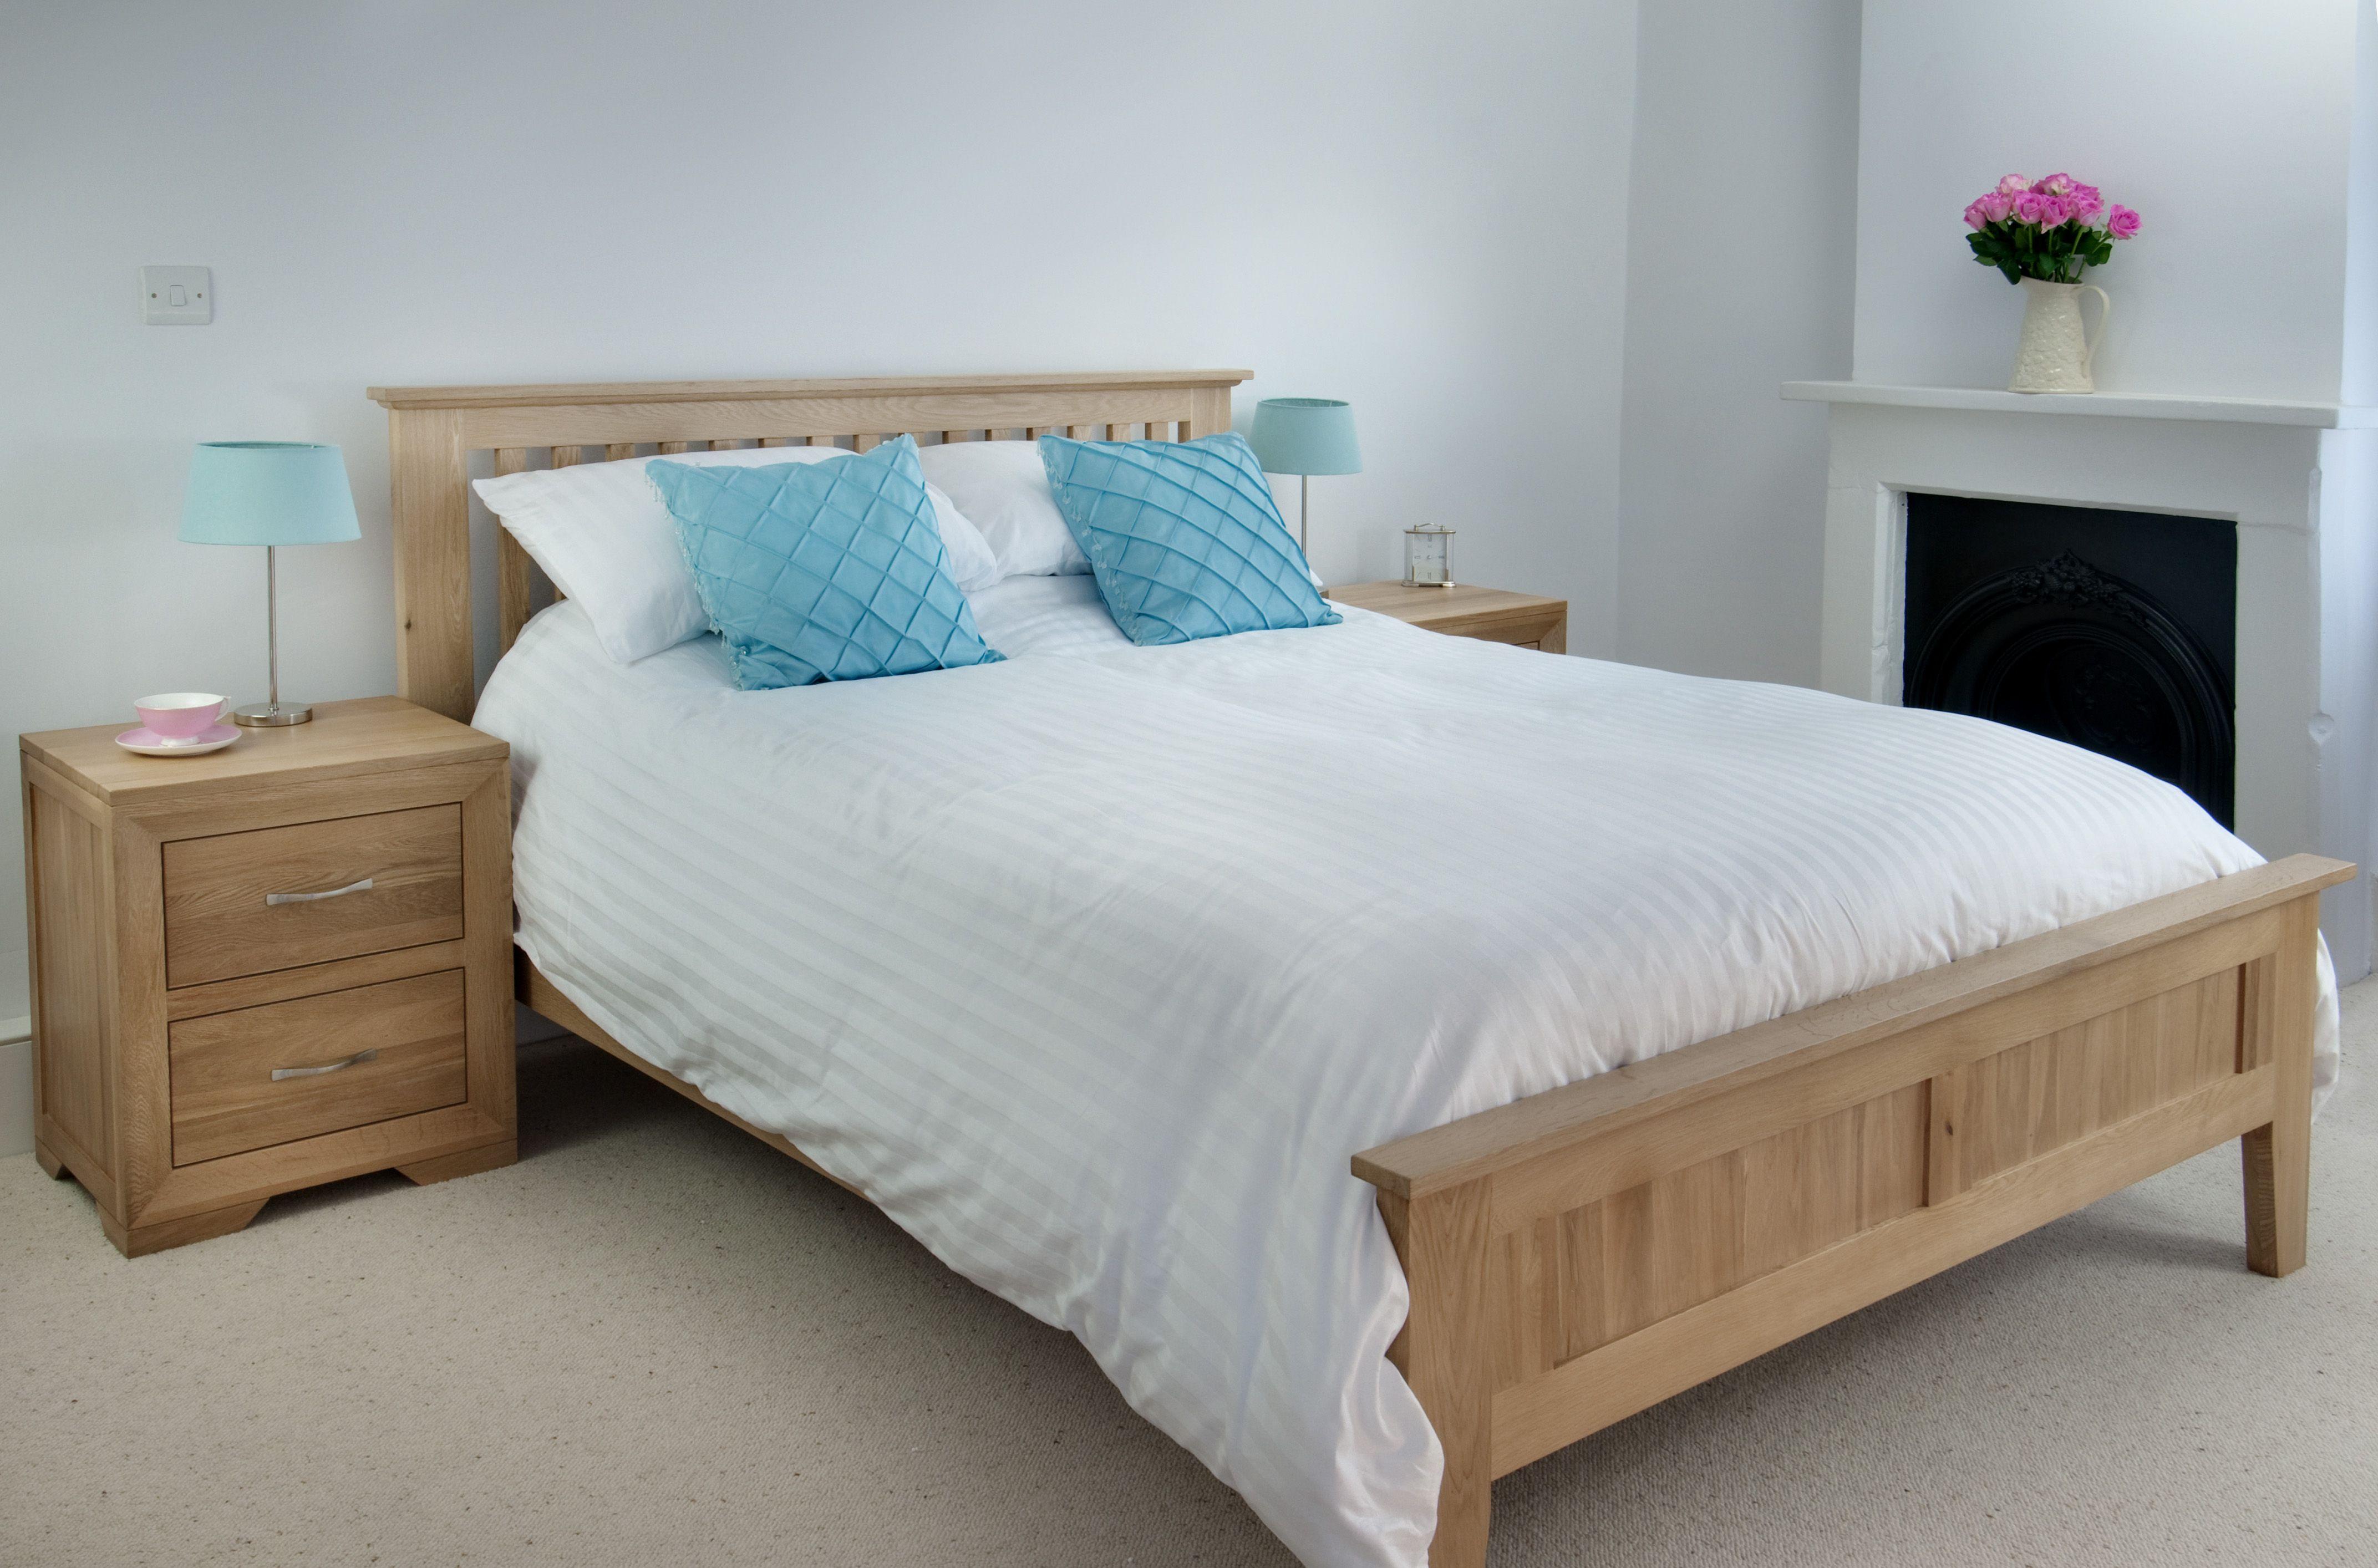 Bevel Solid Oak 4ft 6 Double Bed Style Oak Furniture Bedroom